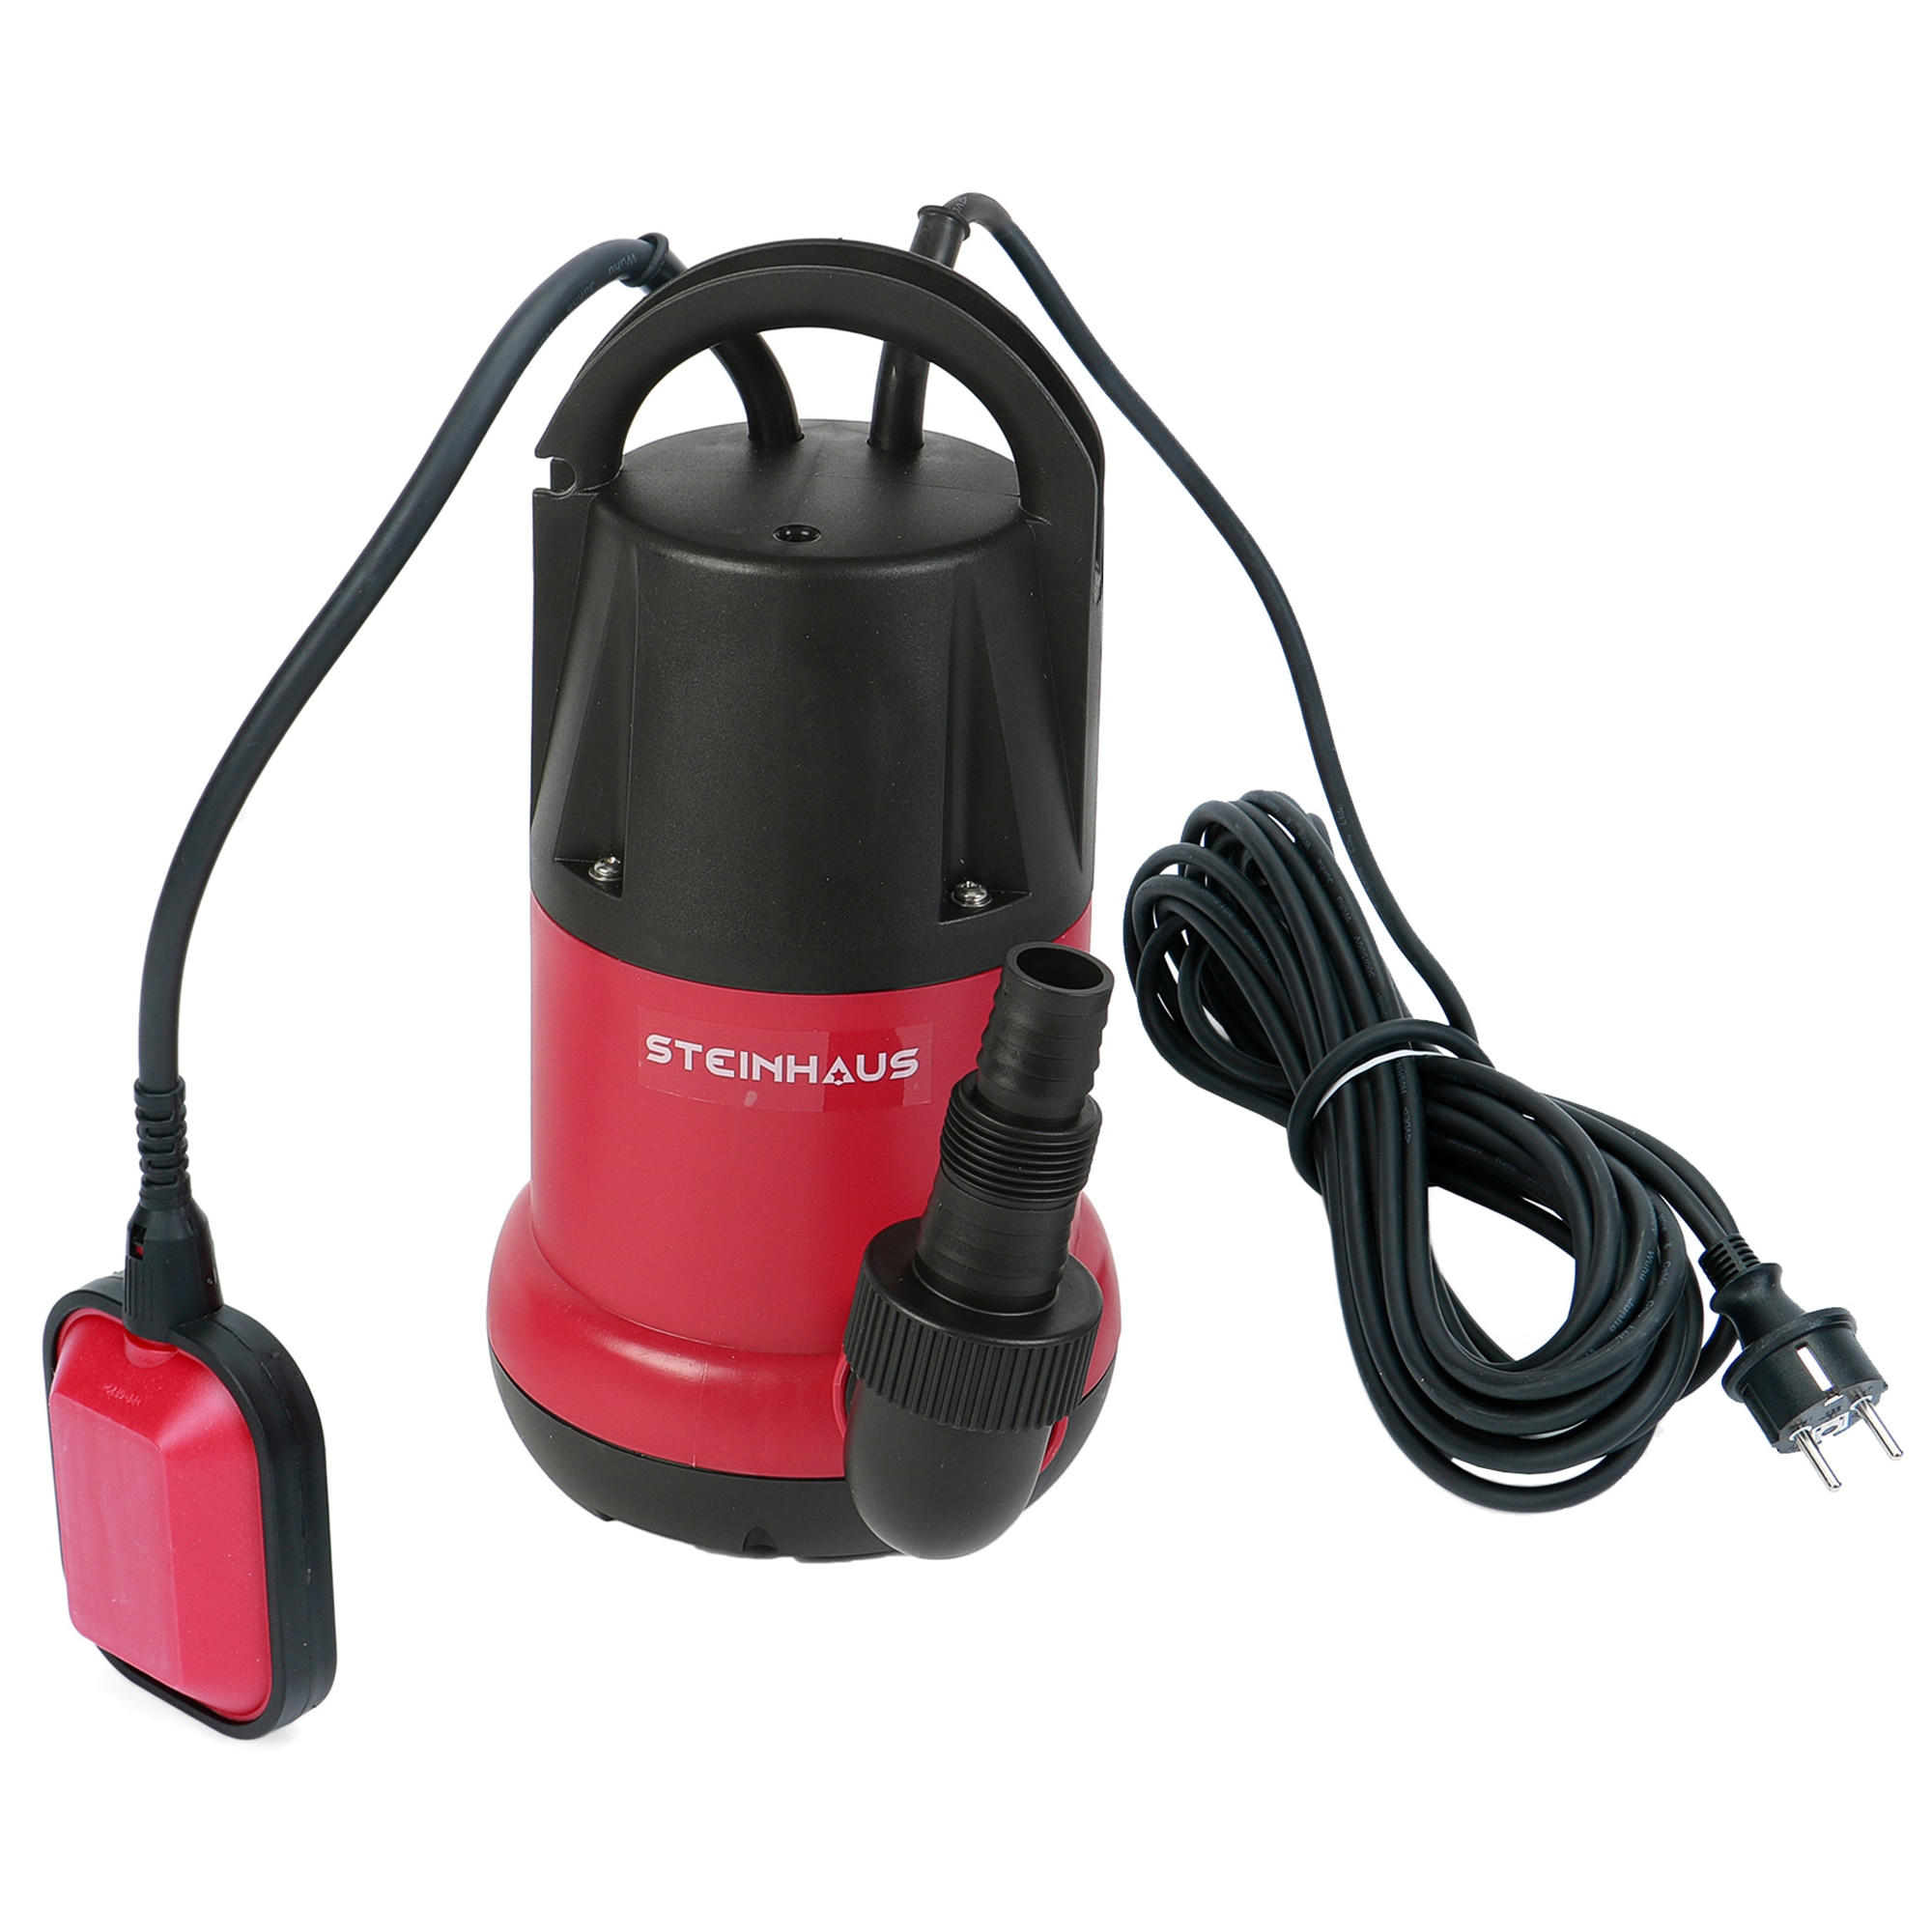 Fotografie Pompa submersibila pentru apa curata Steinhaus PRO-SP400, 400W, 7000 l/h, 0.8 bar